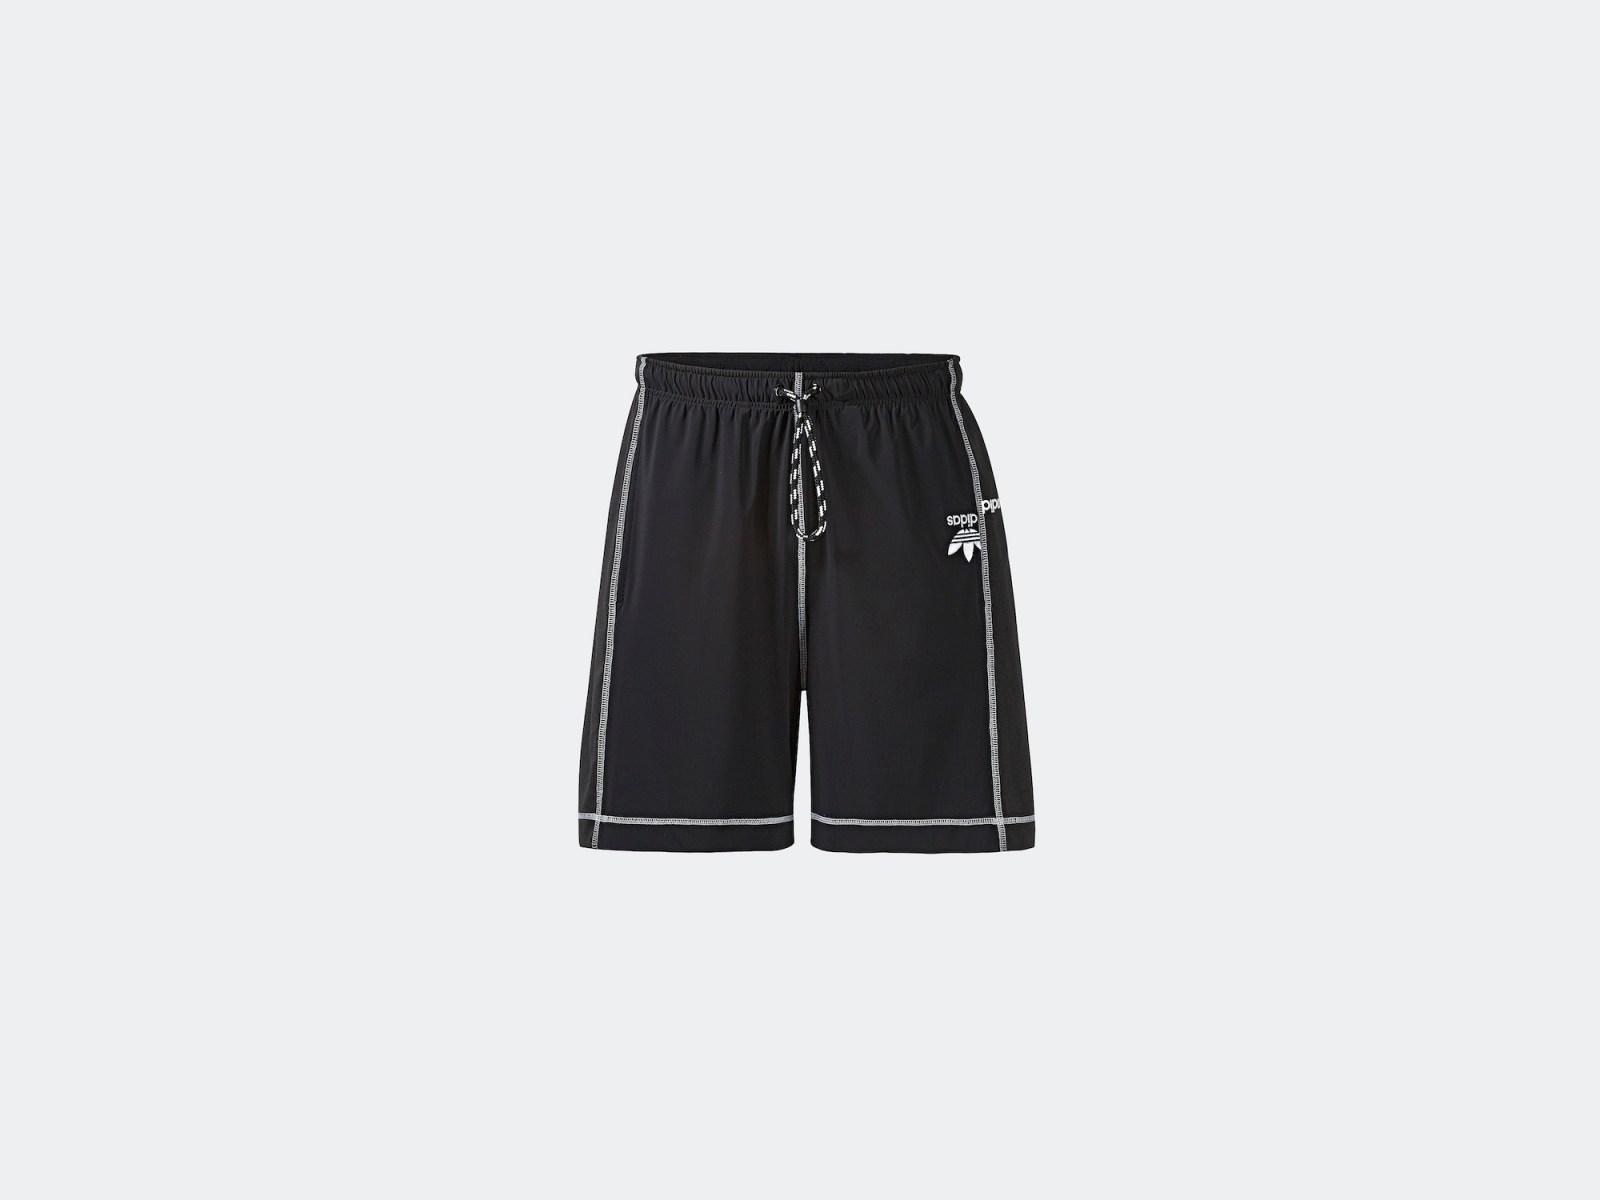 adidas Originals by Alexander Wang 聯名系列 Season 4 正式發佈